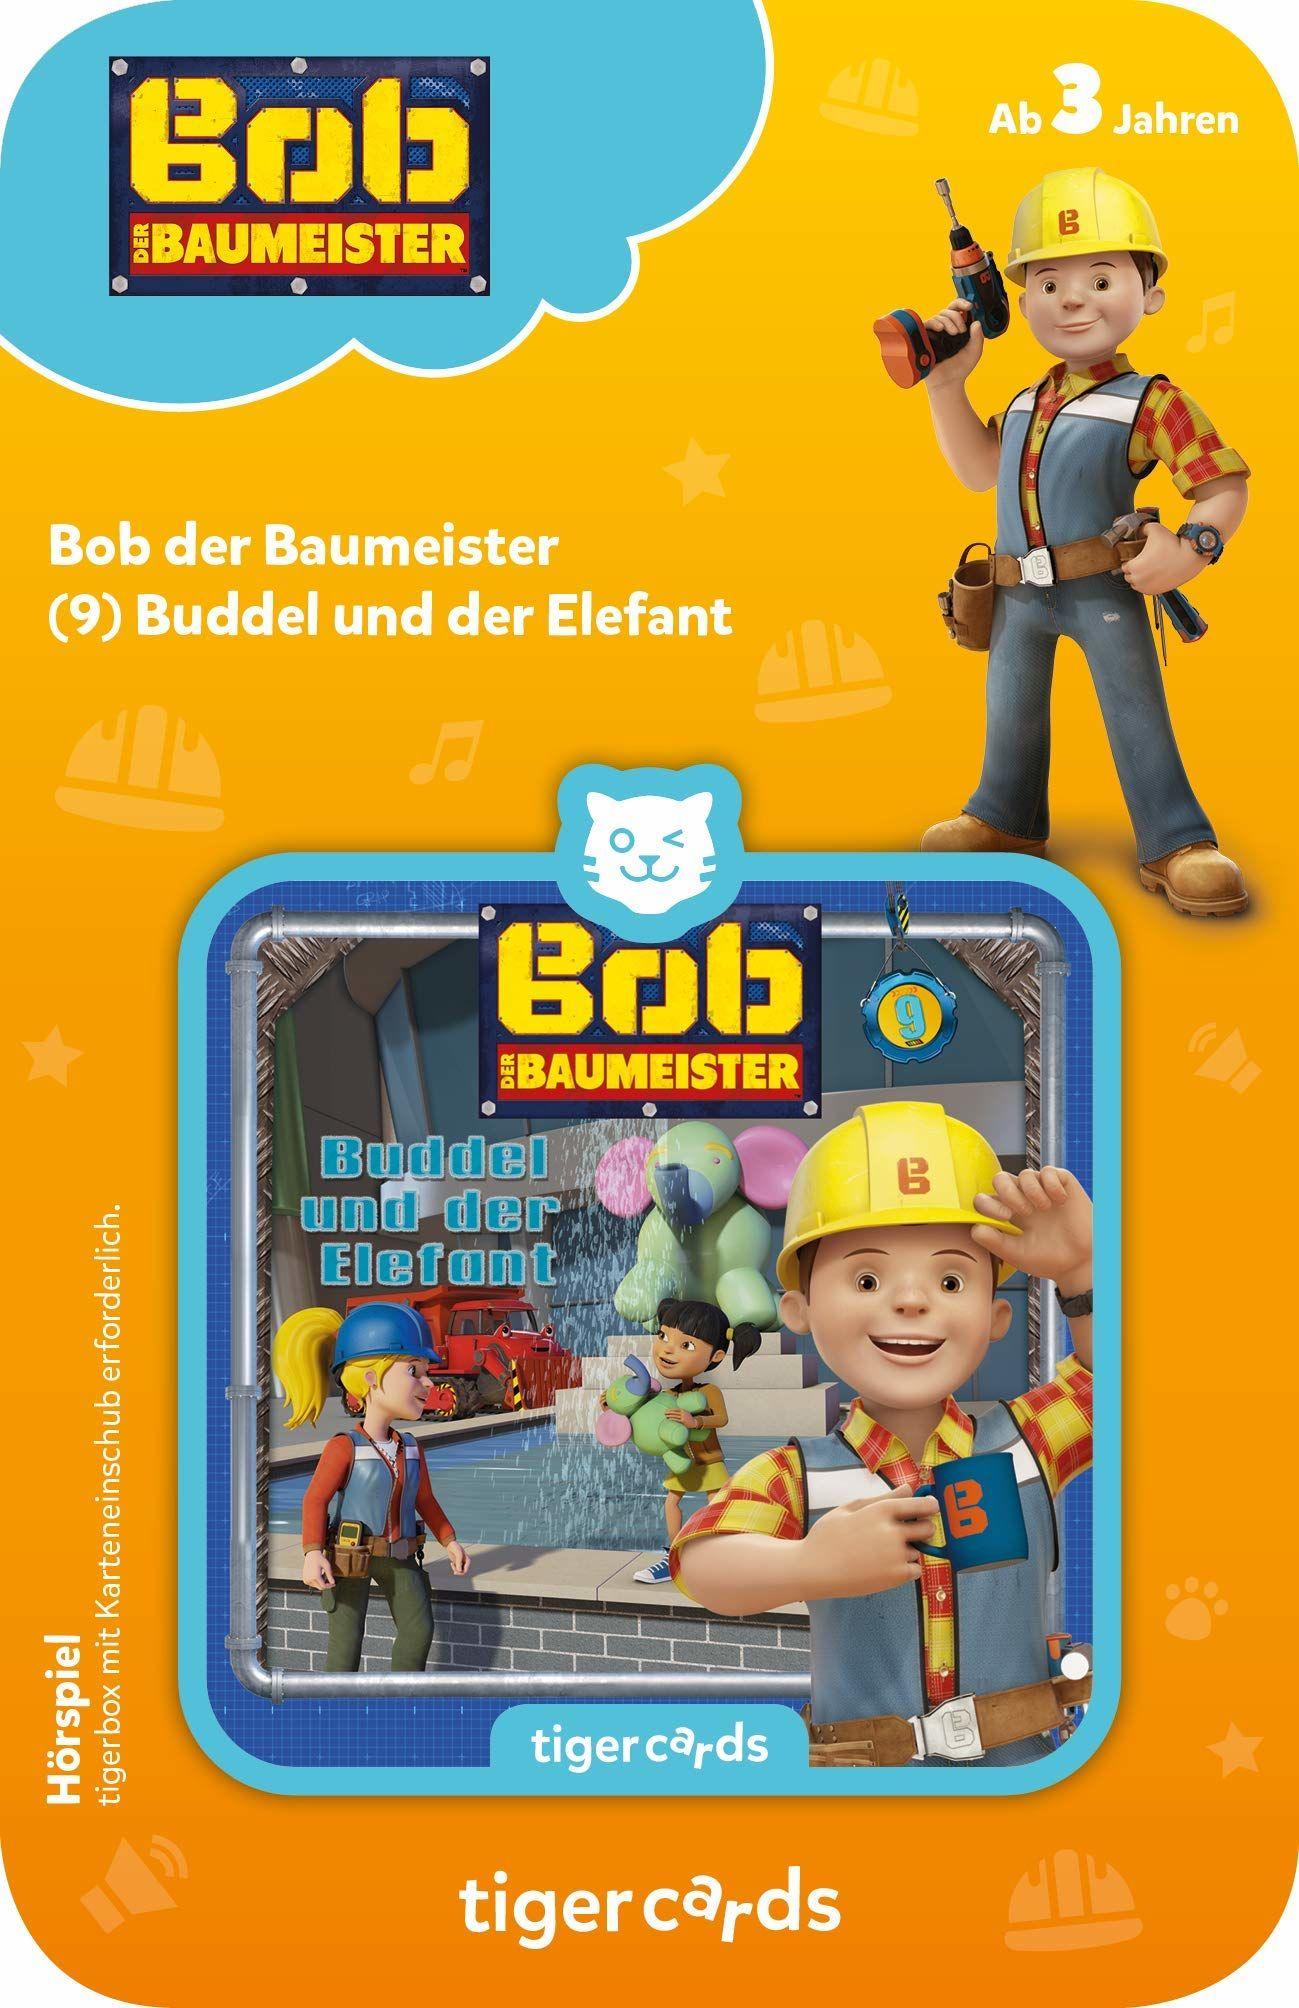 Tigerbox 4155 tigercard-Bob Roki Buddy słonia 9: Buddel